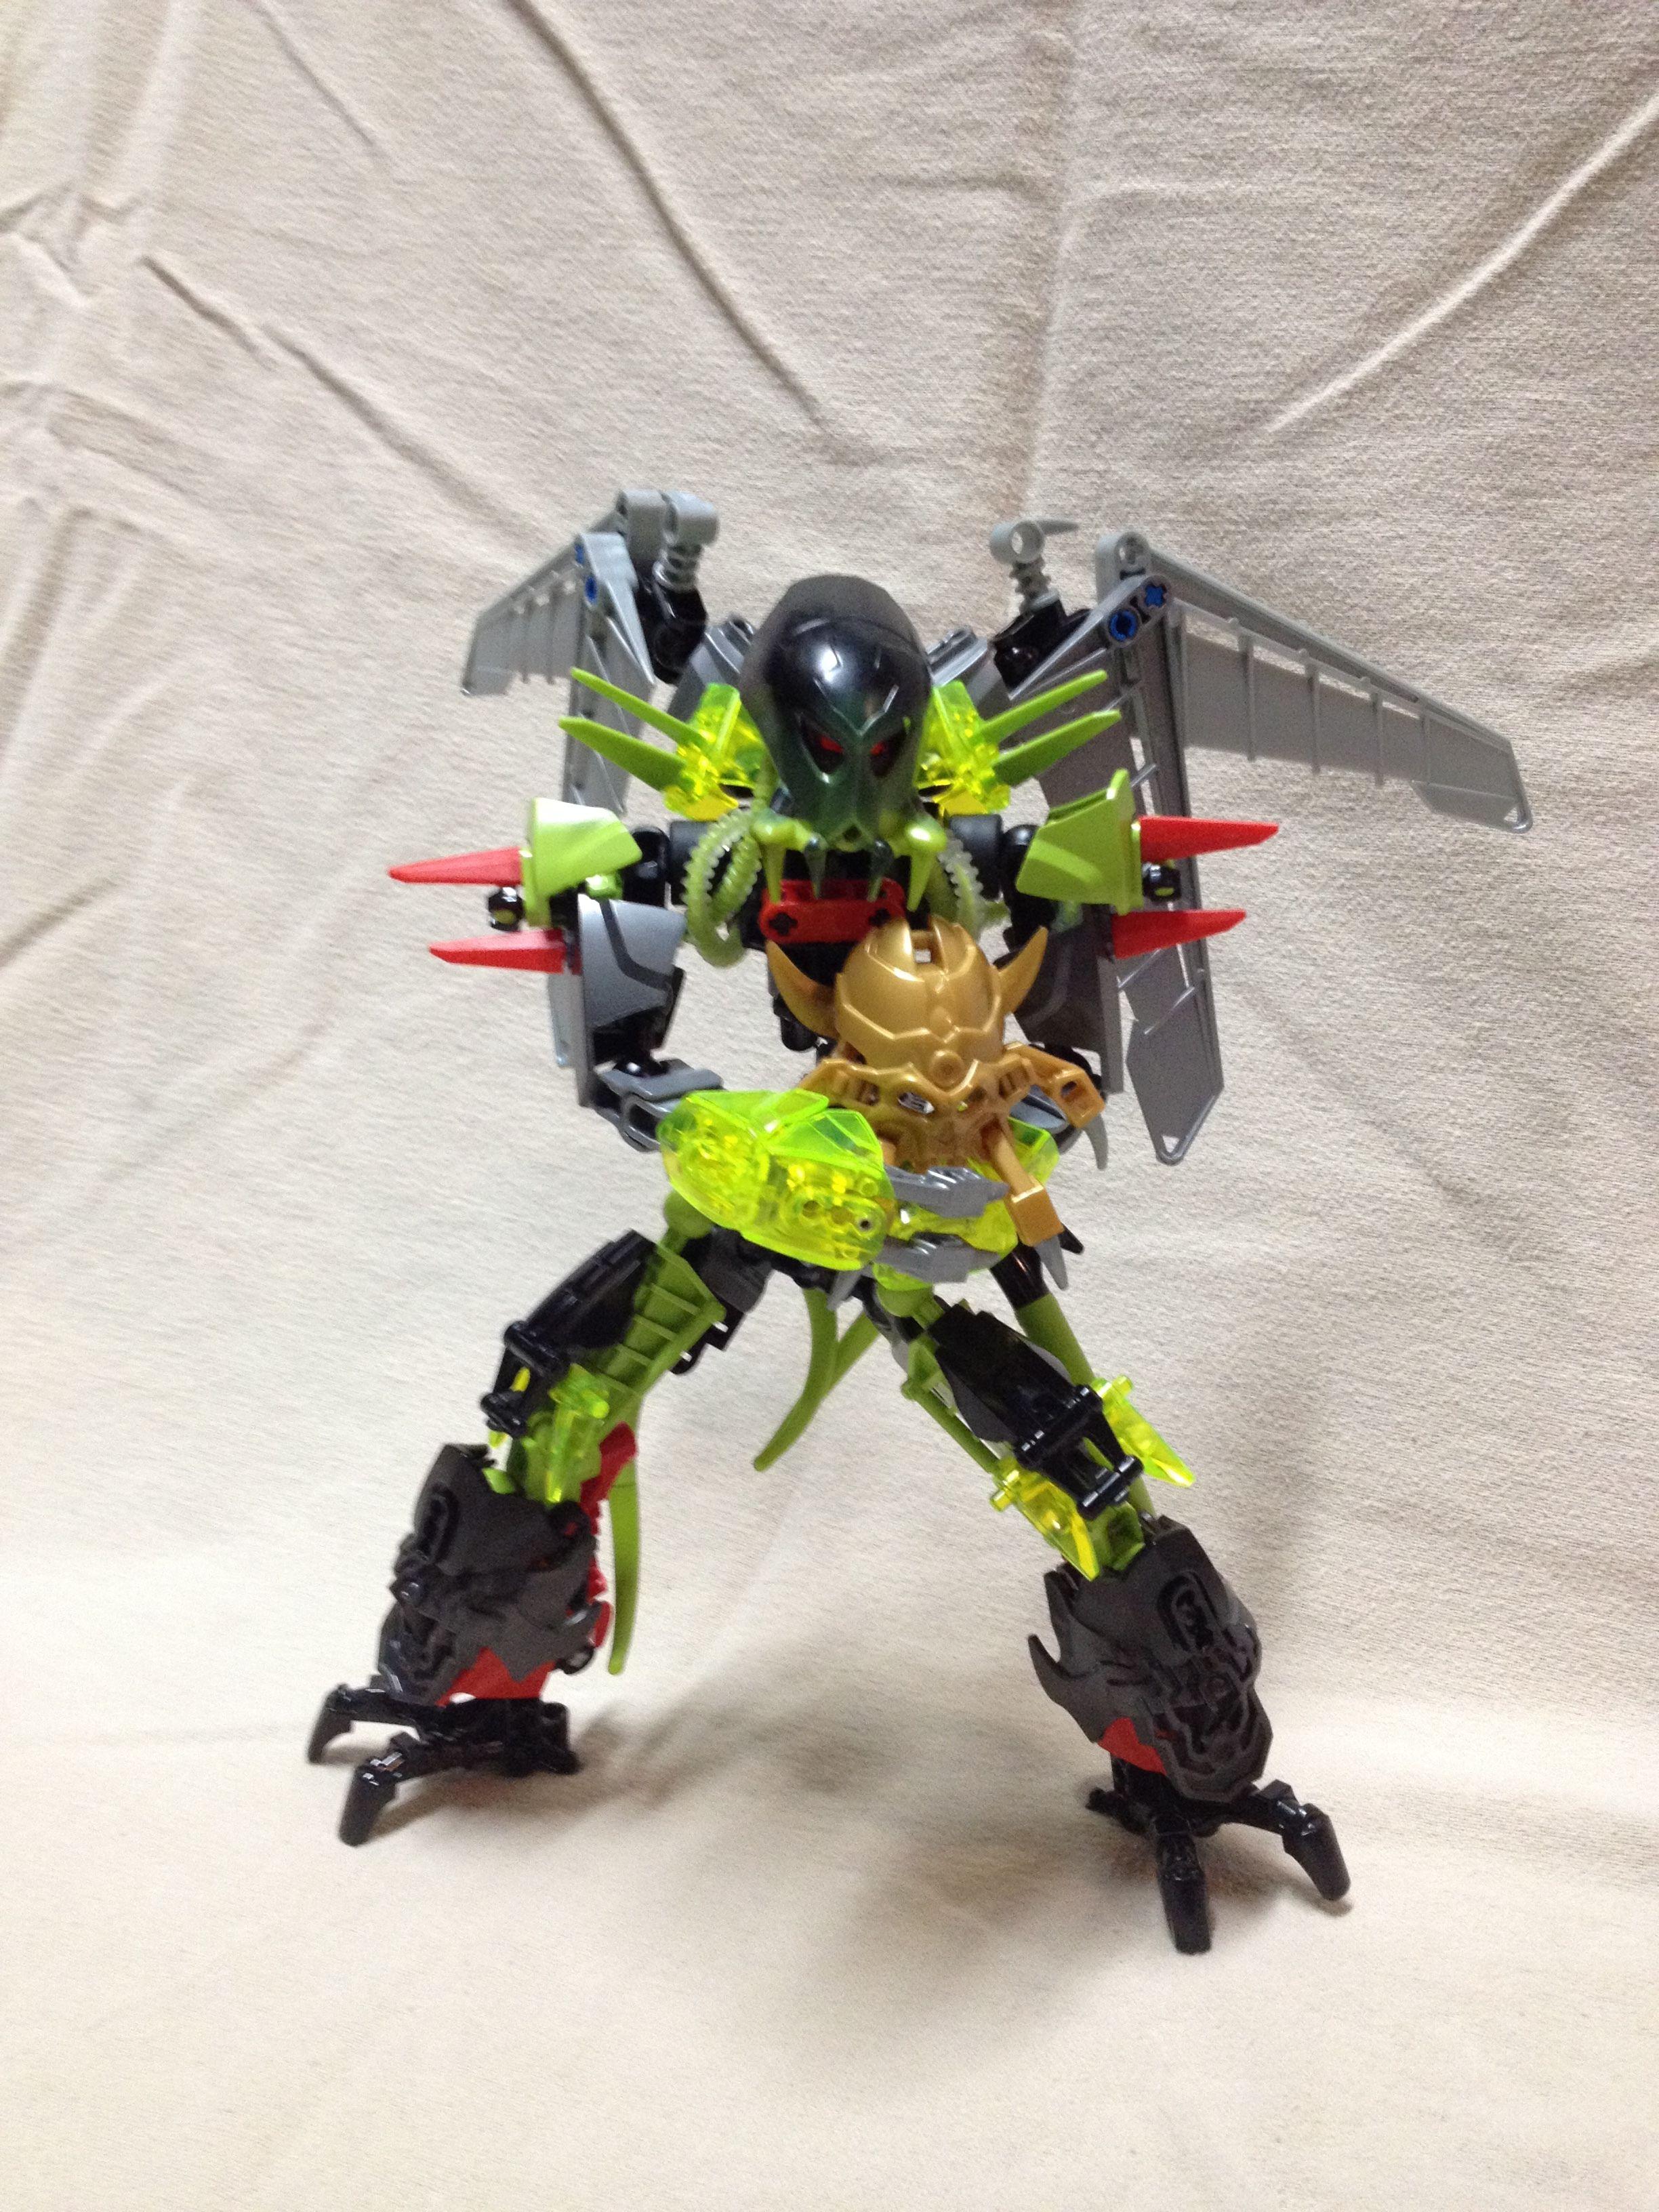 Лего Биониклы (Bionicle) - каталог наборов с инструкциями 77